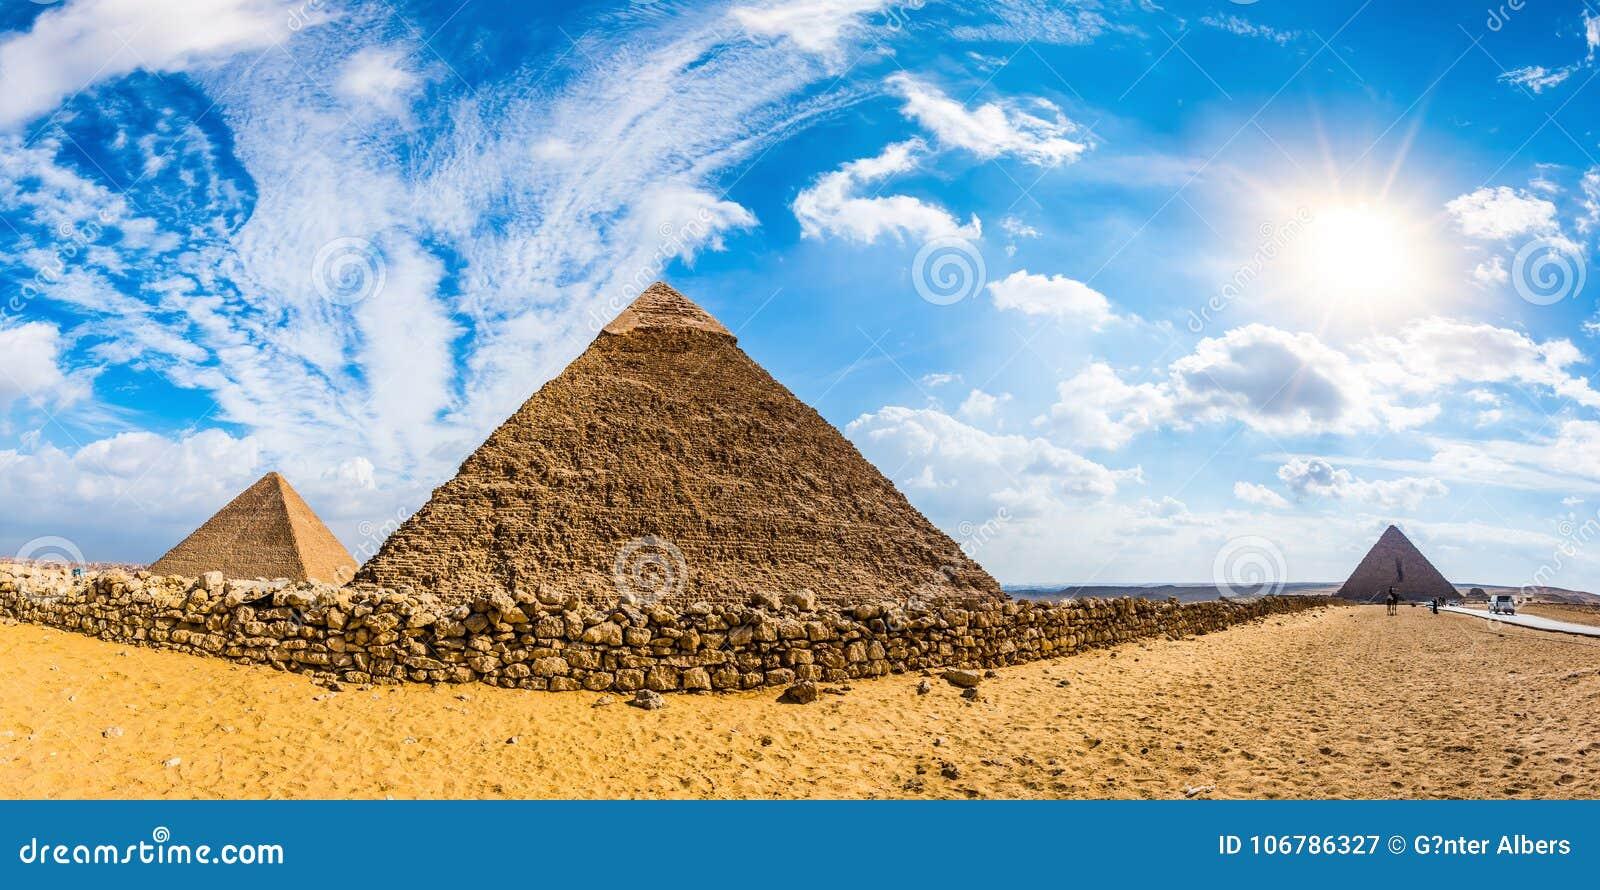 The Great Pyramids Of Giza, Egypt Stock Image - Image of fisheye